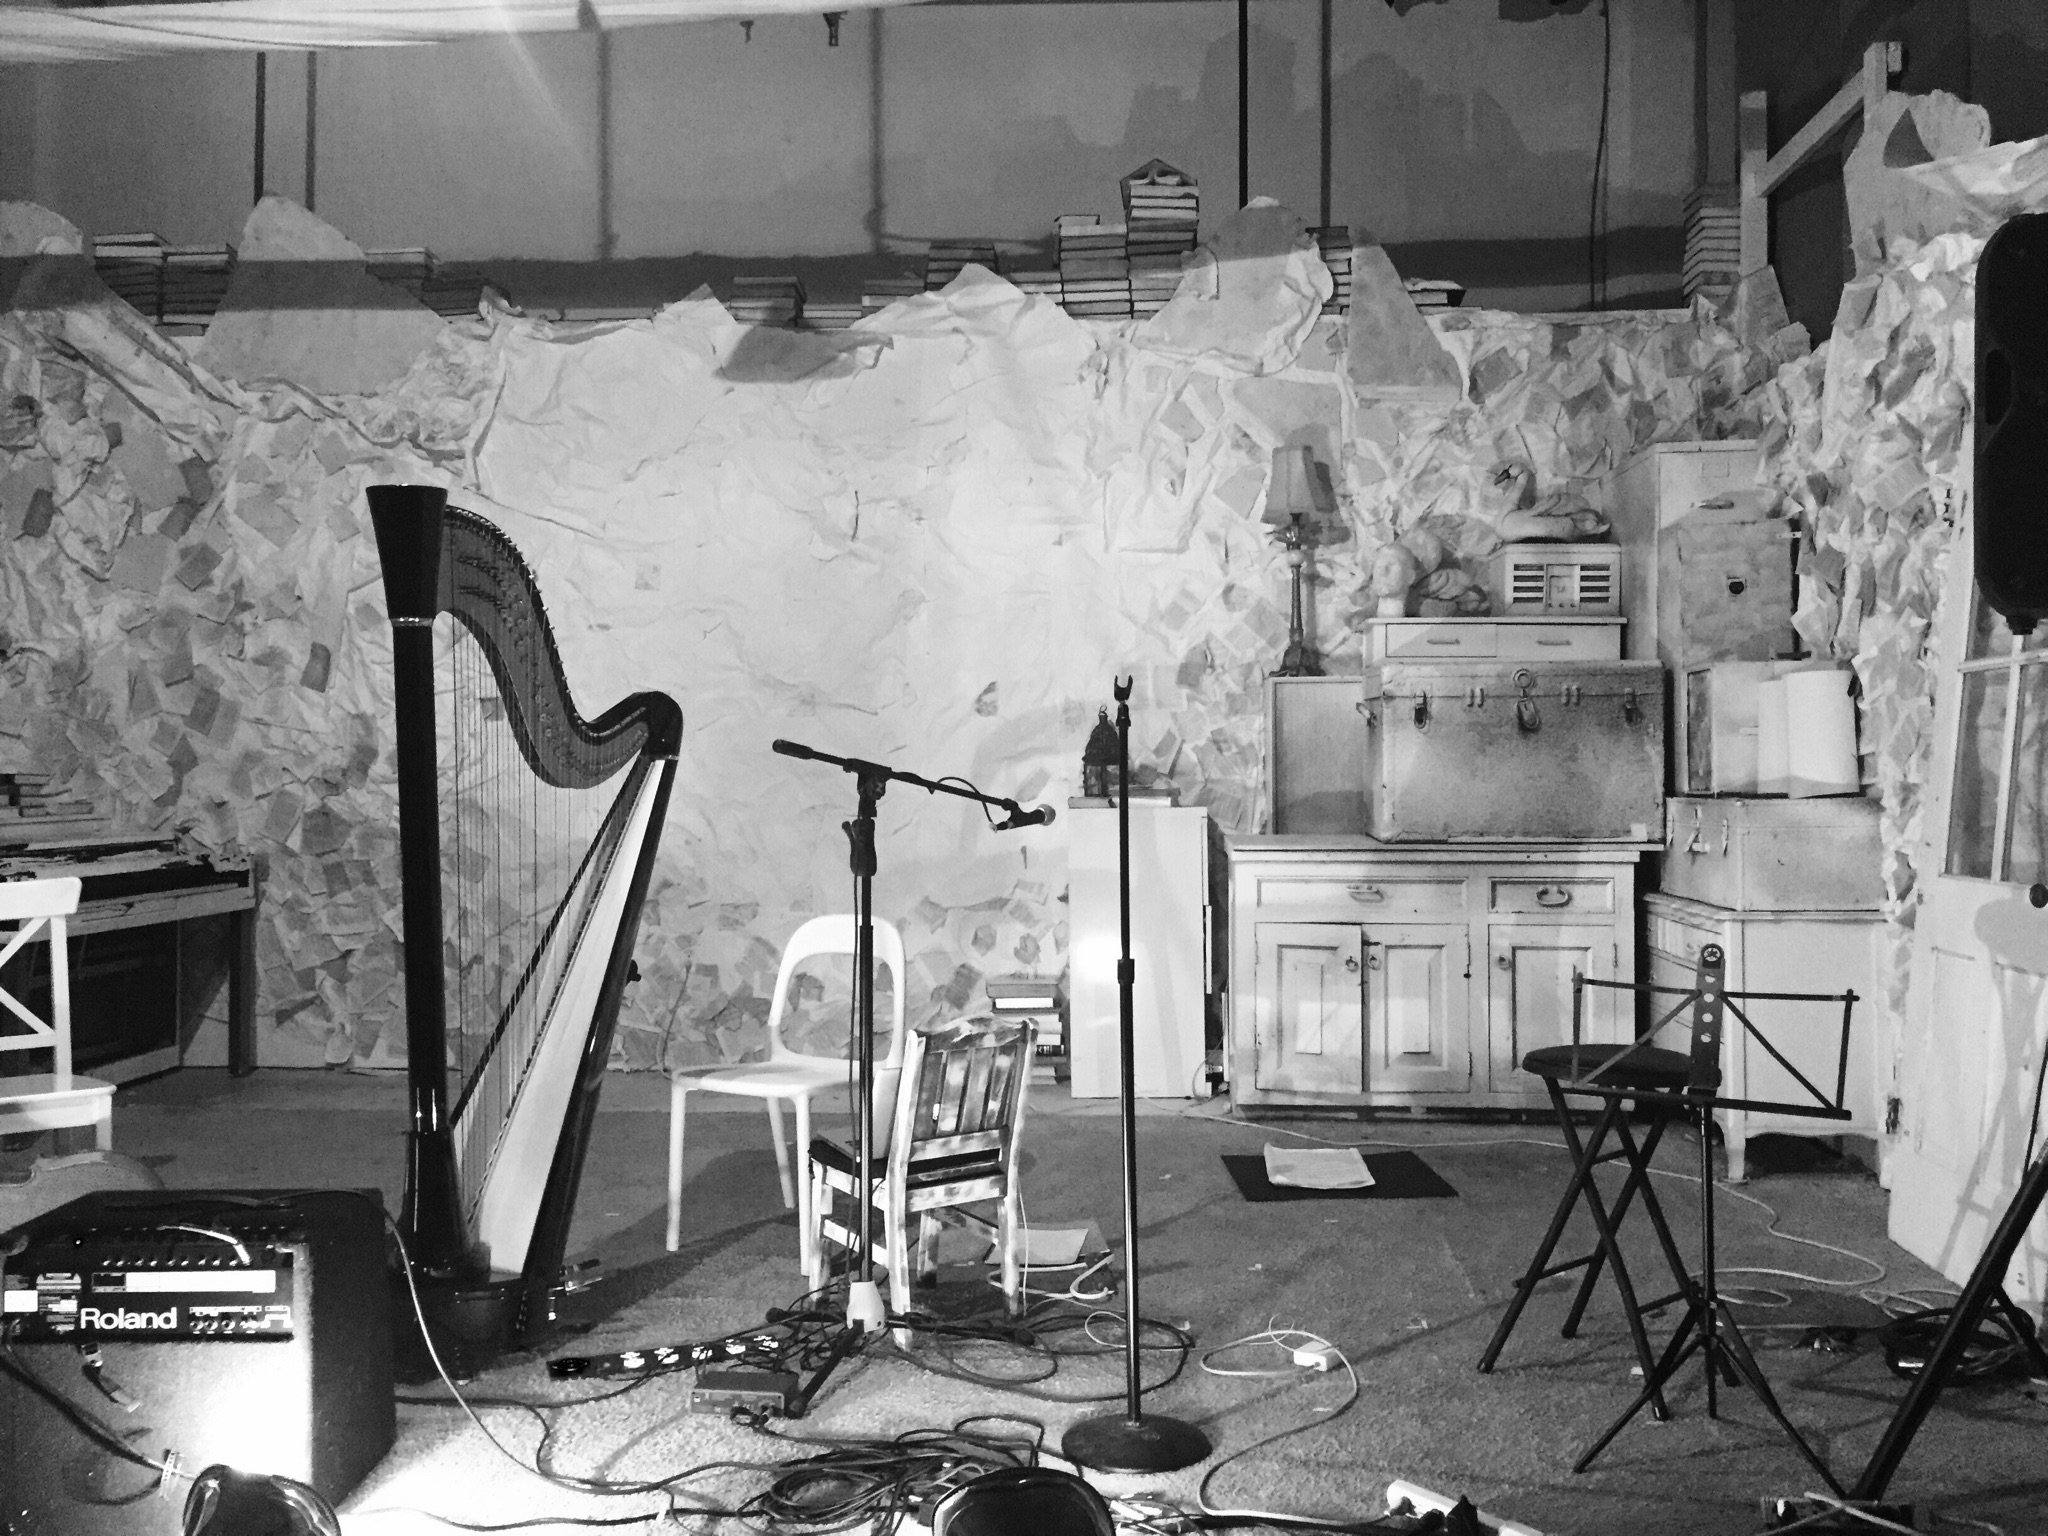 Harp & Empty stage black and white.JPG